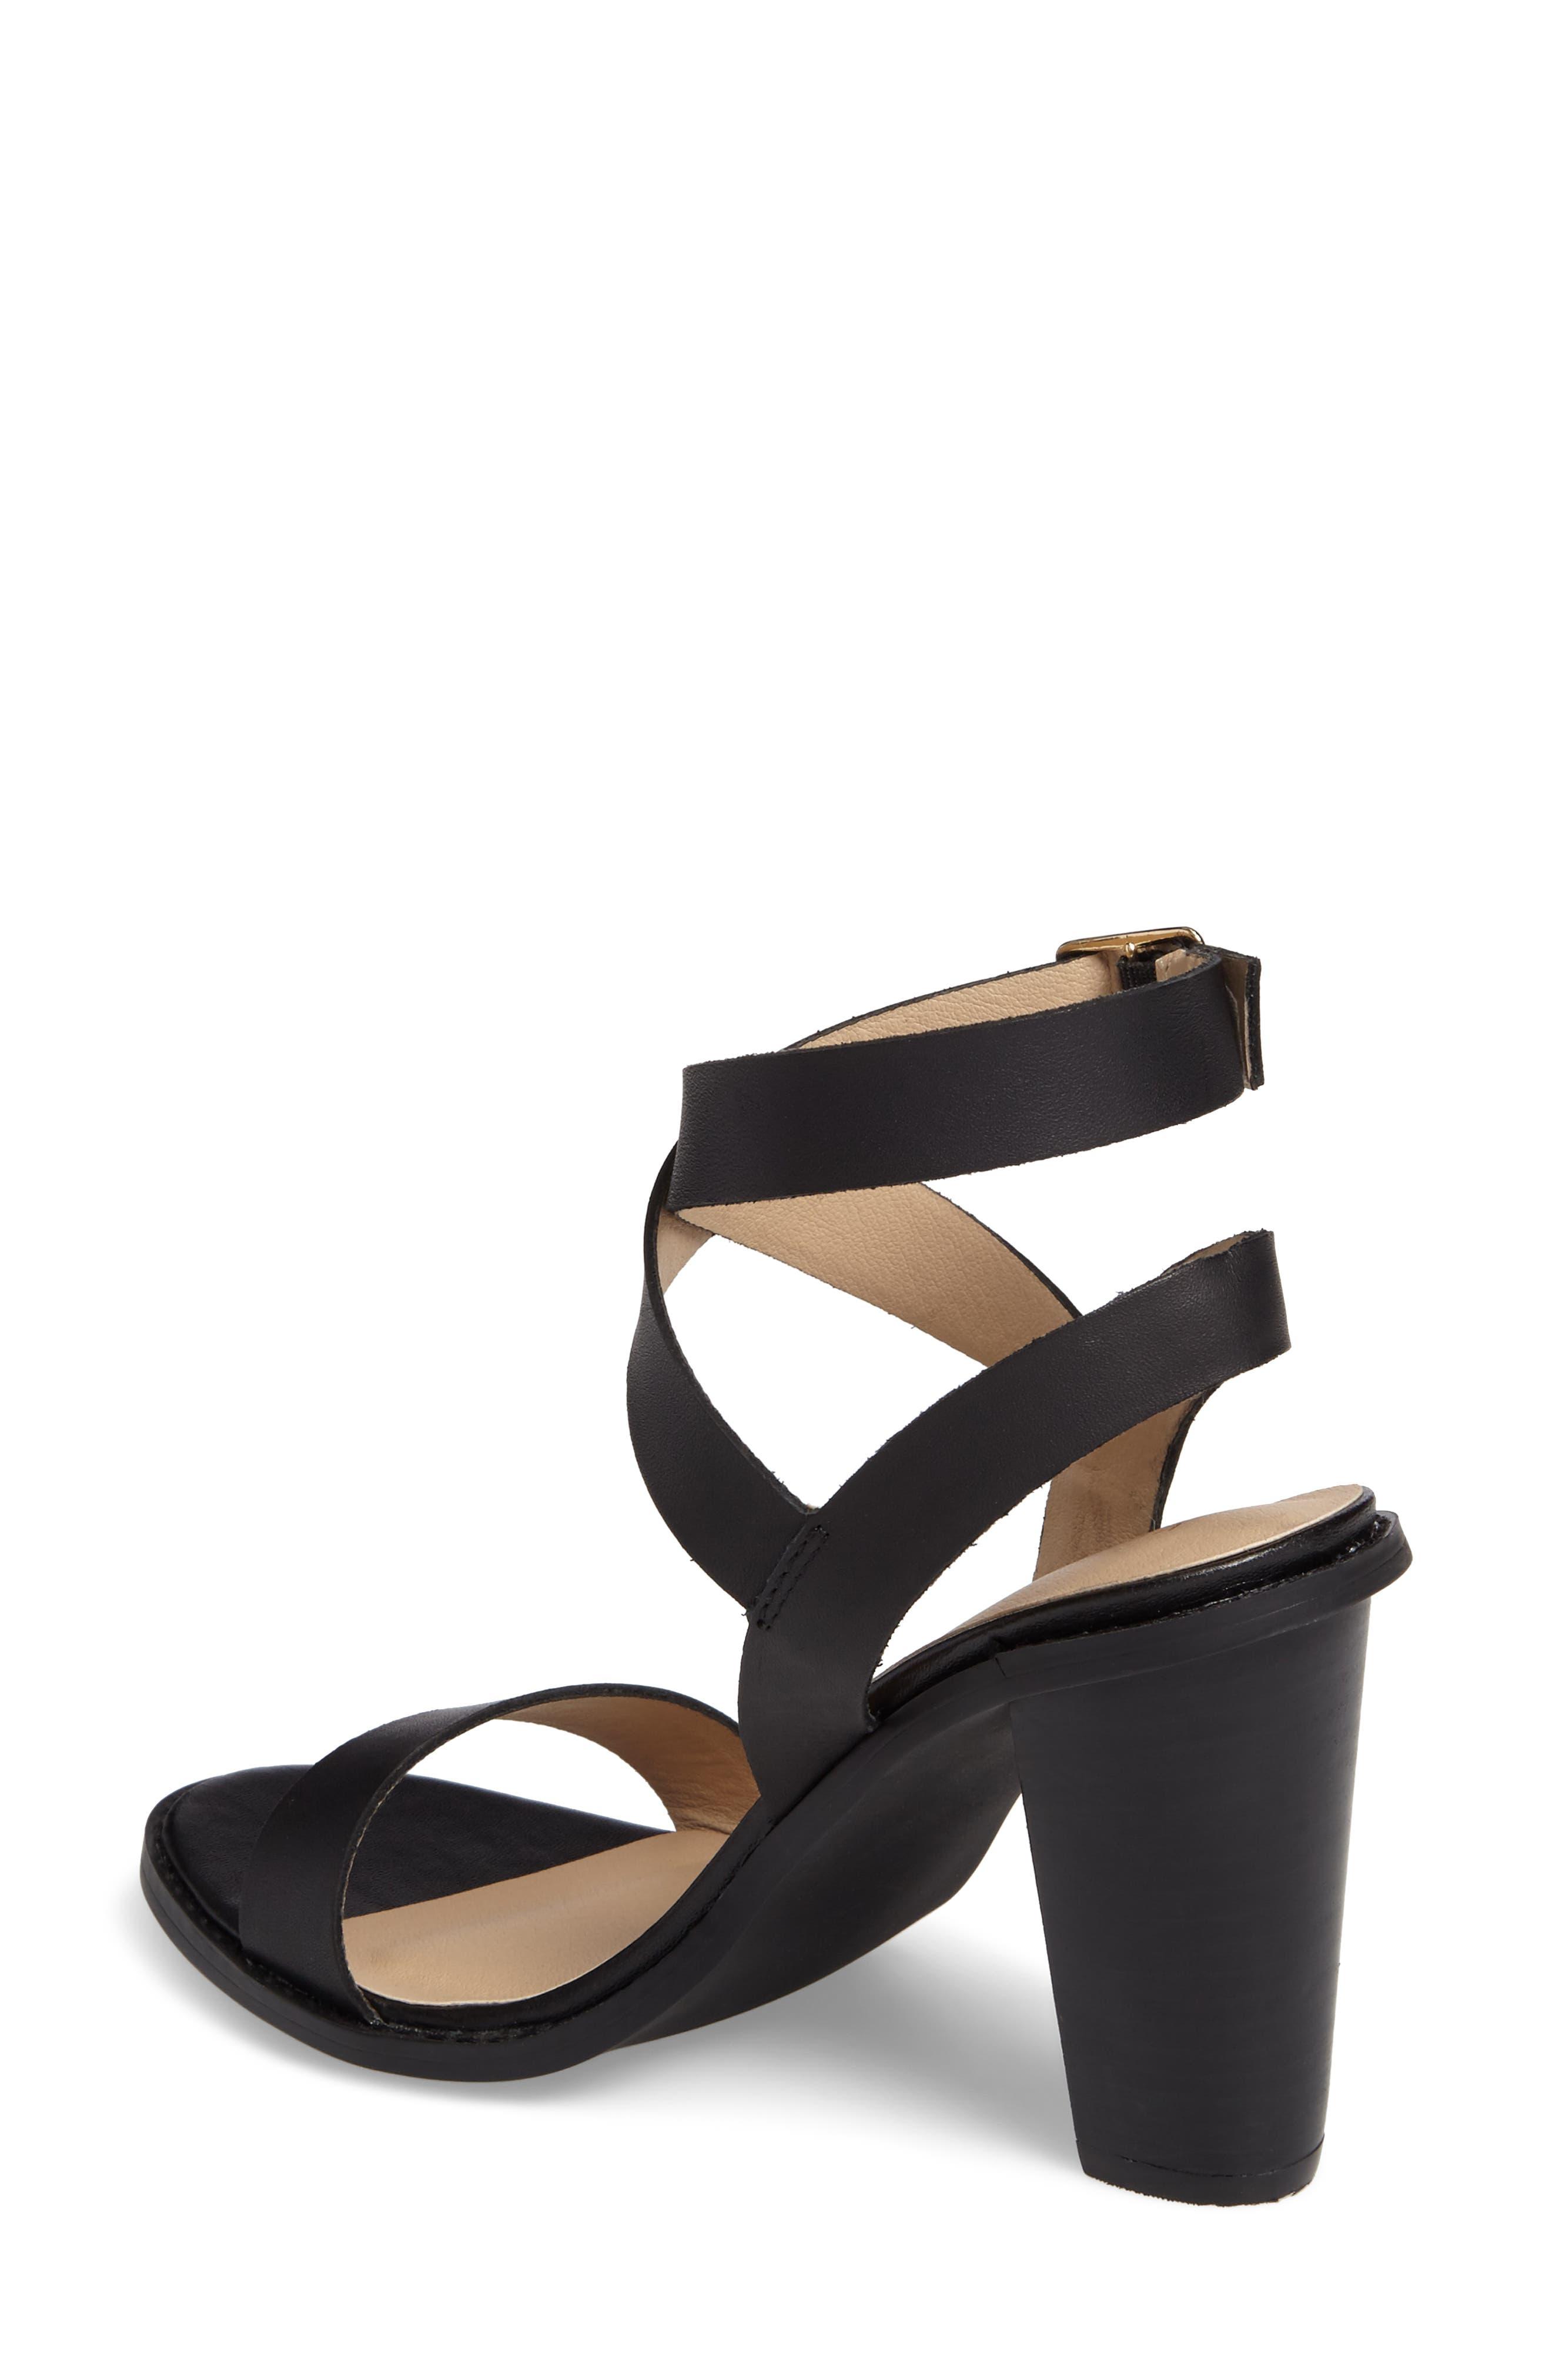 Poshy Ankle Wrap Sandal,                             Alternate thumbnail 2, color,                             BLACK LEATHER